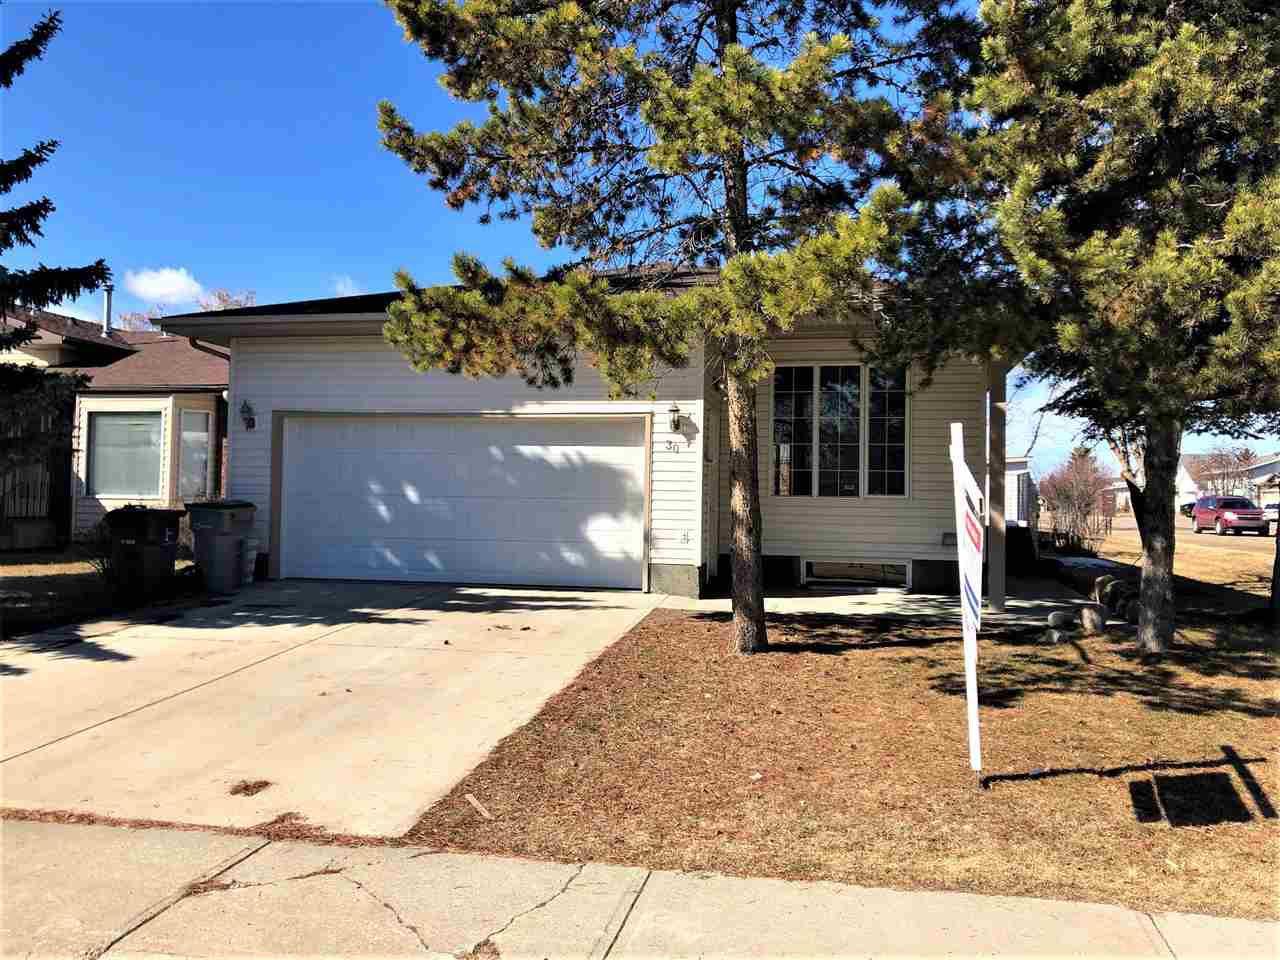 Main Photo: 30 GLENDALE Crescent: Stony Plain House for sale : MLS®# E4154806